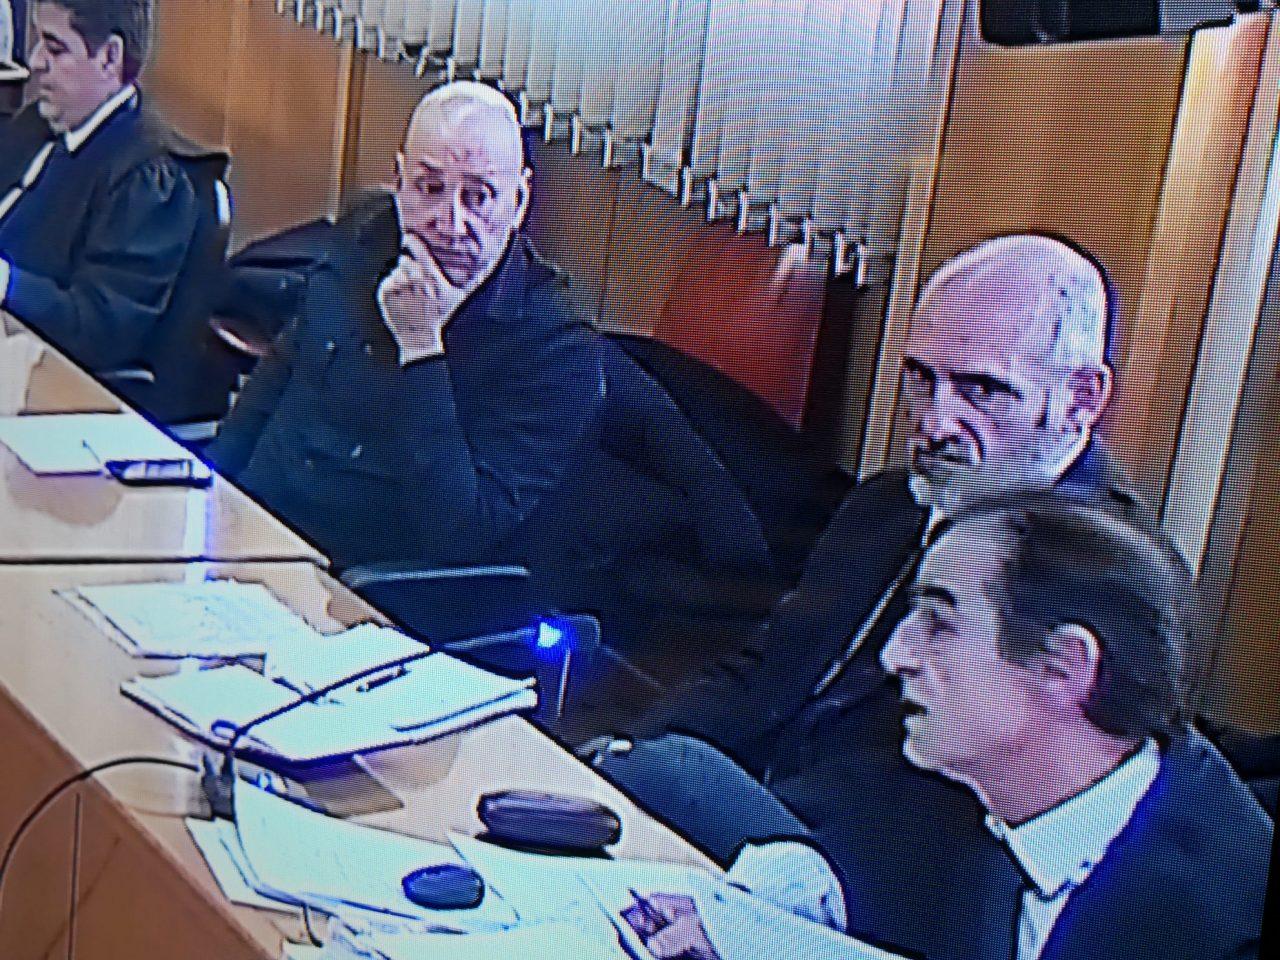 judici_mossos7-1-1280x960.jpg